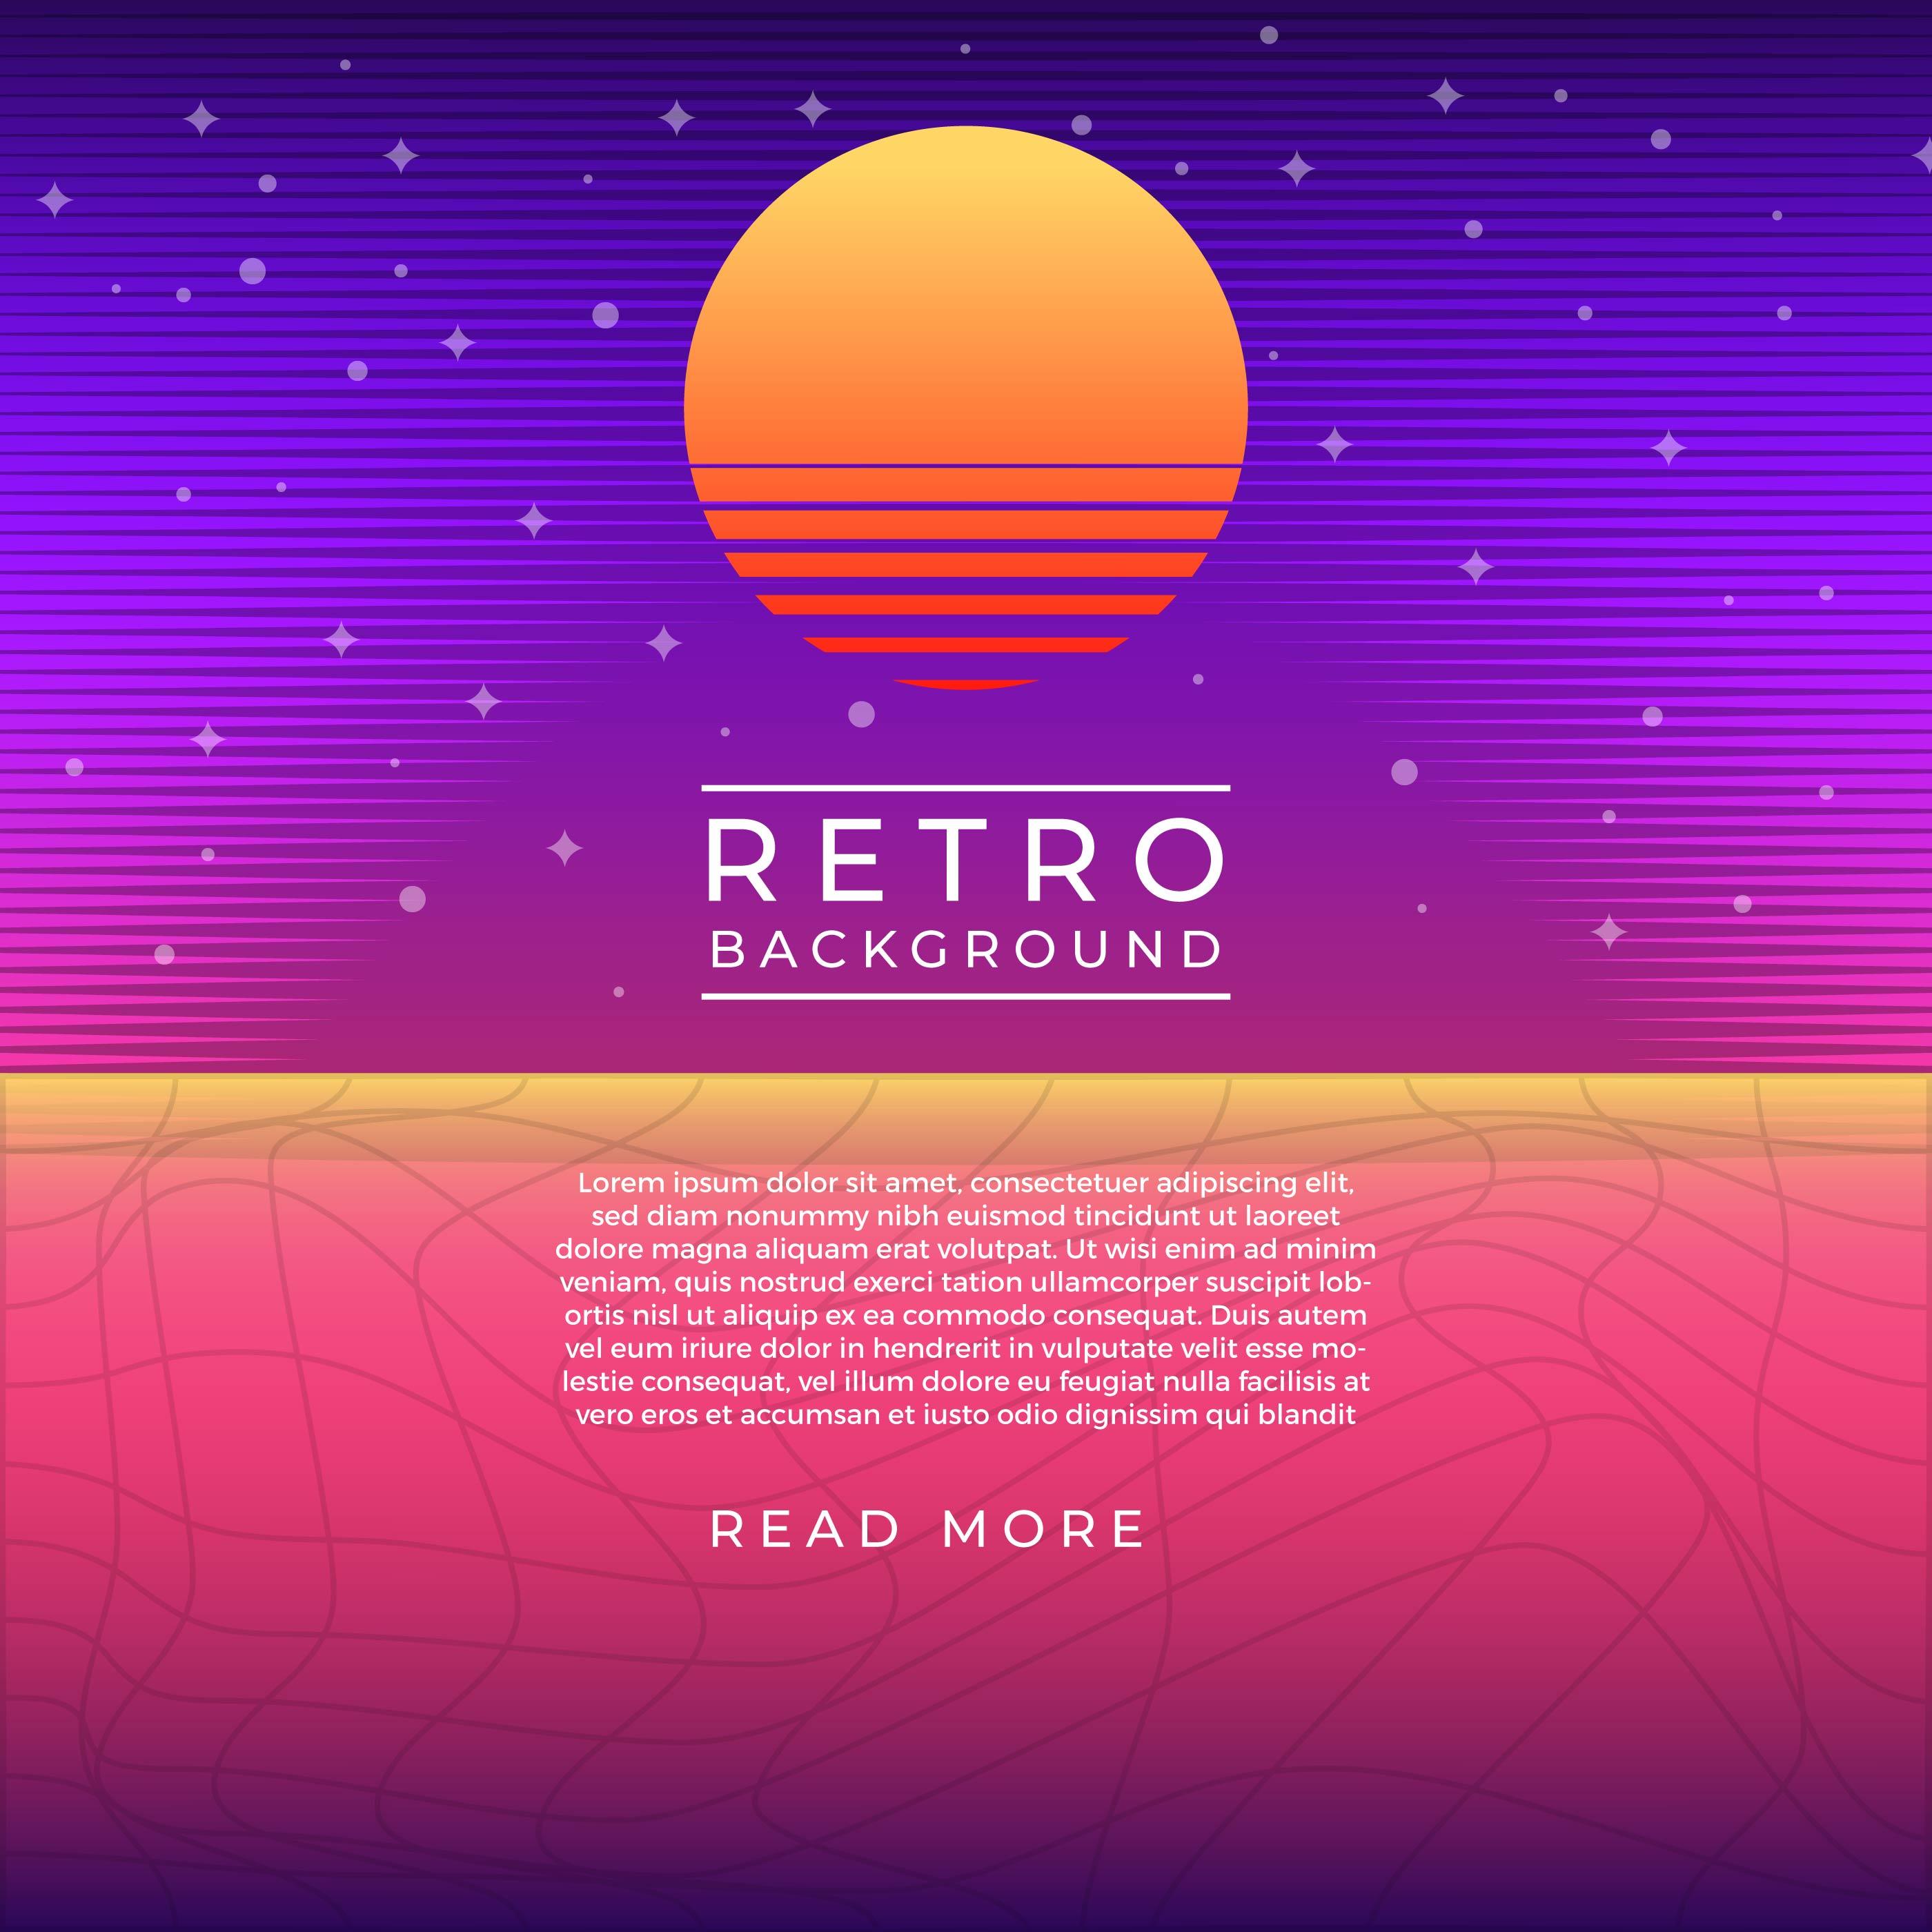 9f6b7287f820 Purple Background Design - (111533 Free Downloads)